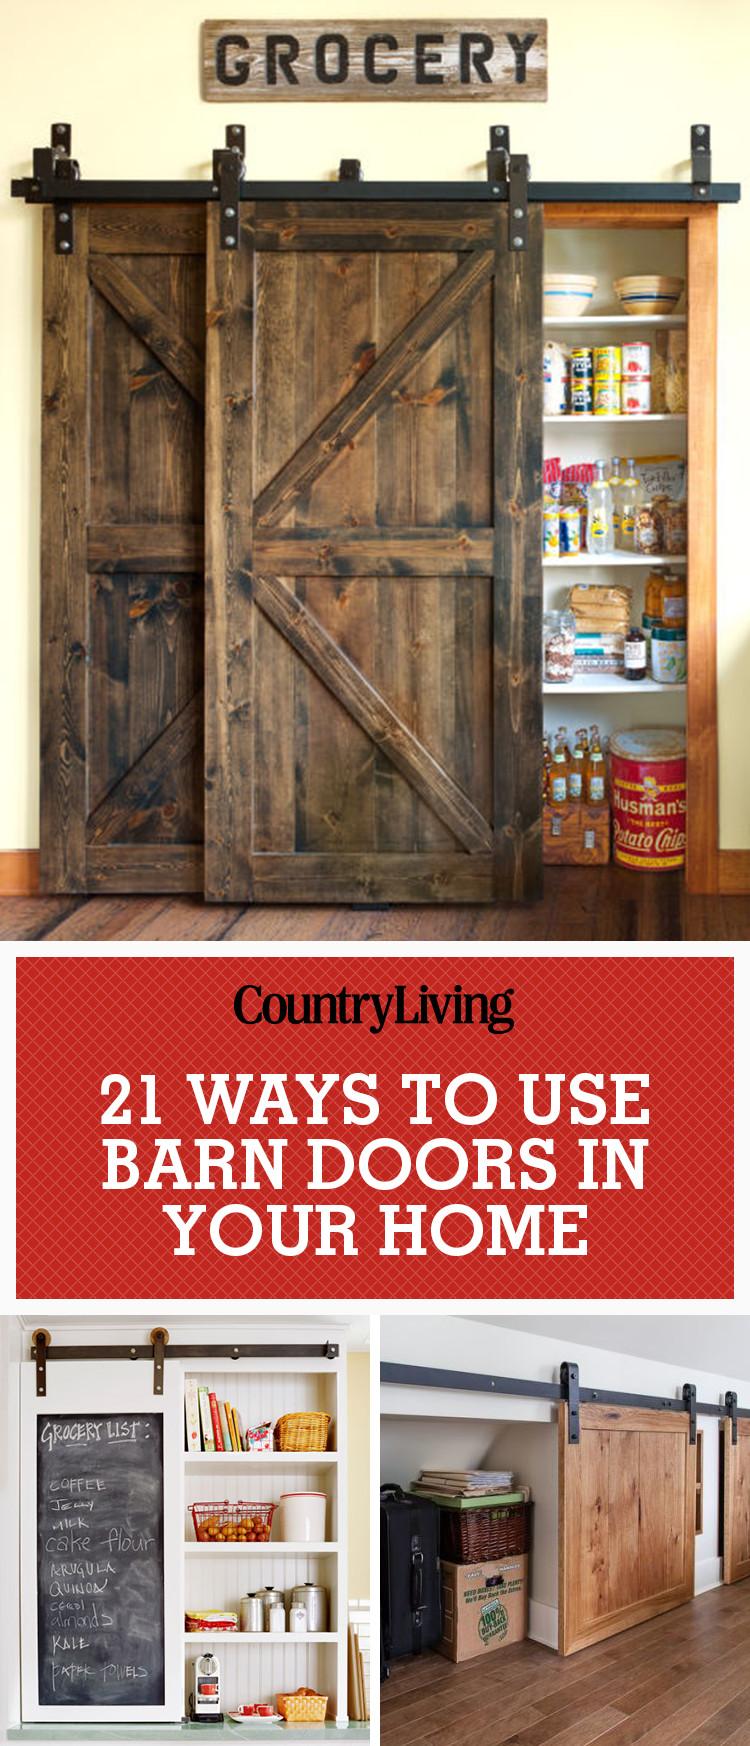 20+ Best Barn Door Ideas — Ways To Use A Barn Door